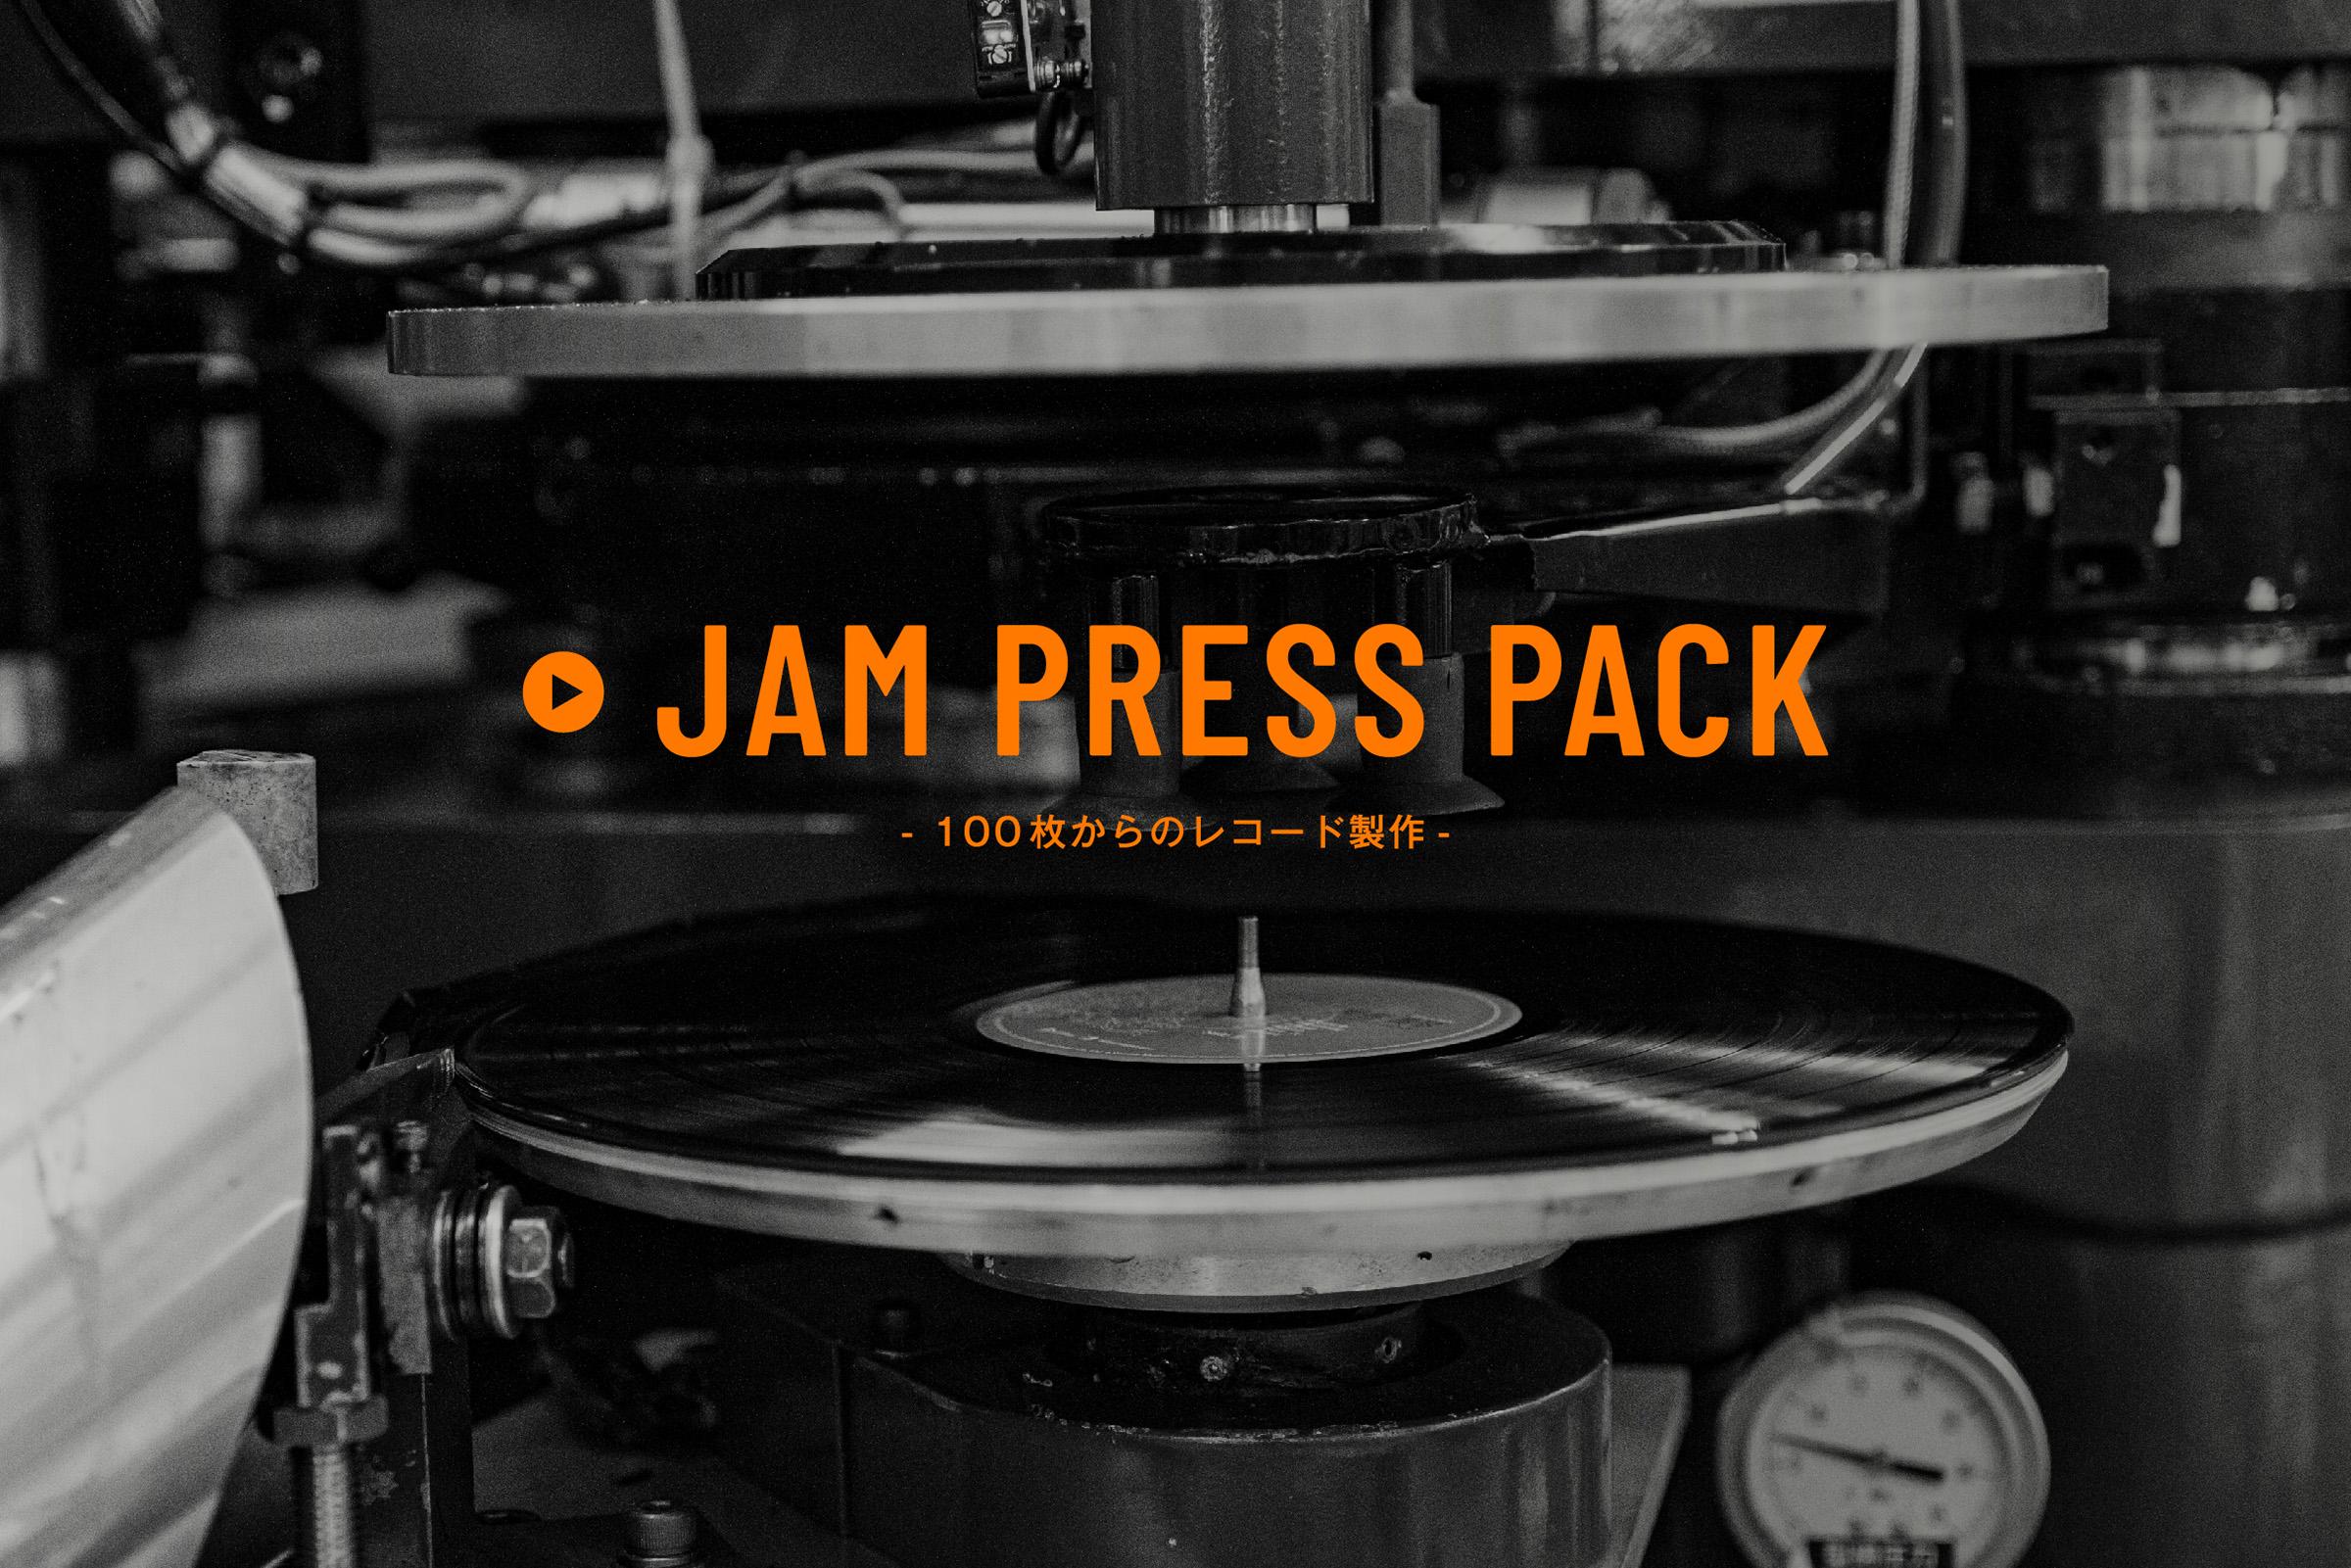 JAM PRESS PACK -100枚からのレコード製作-